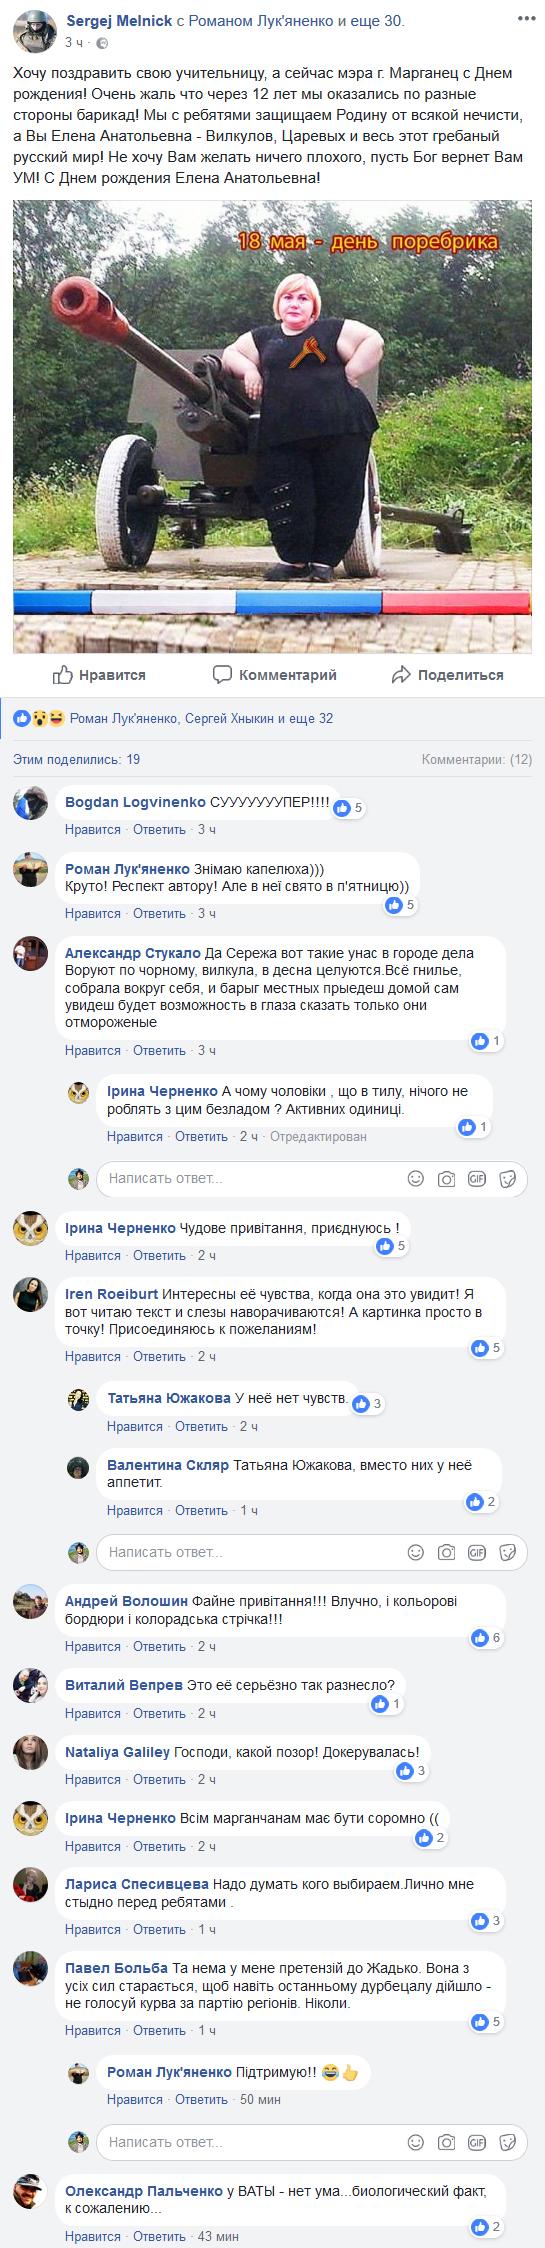 Screenshot-2018-5-16